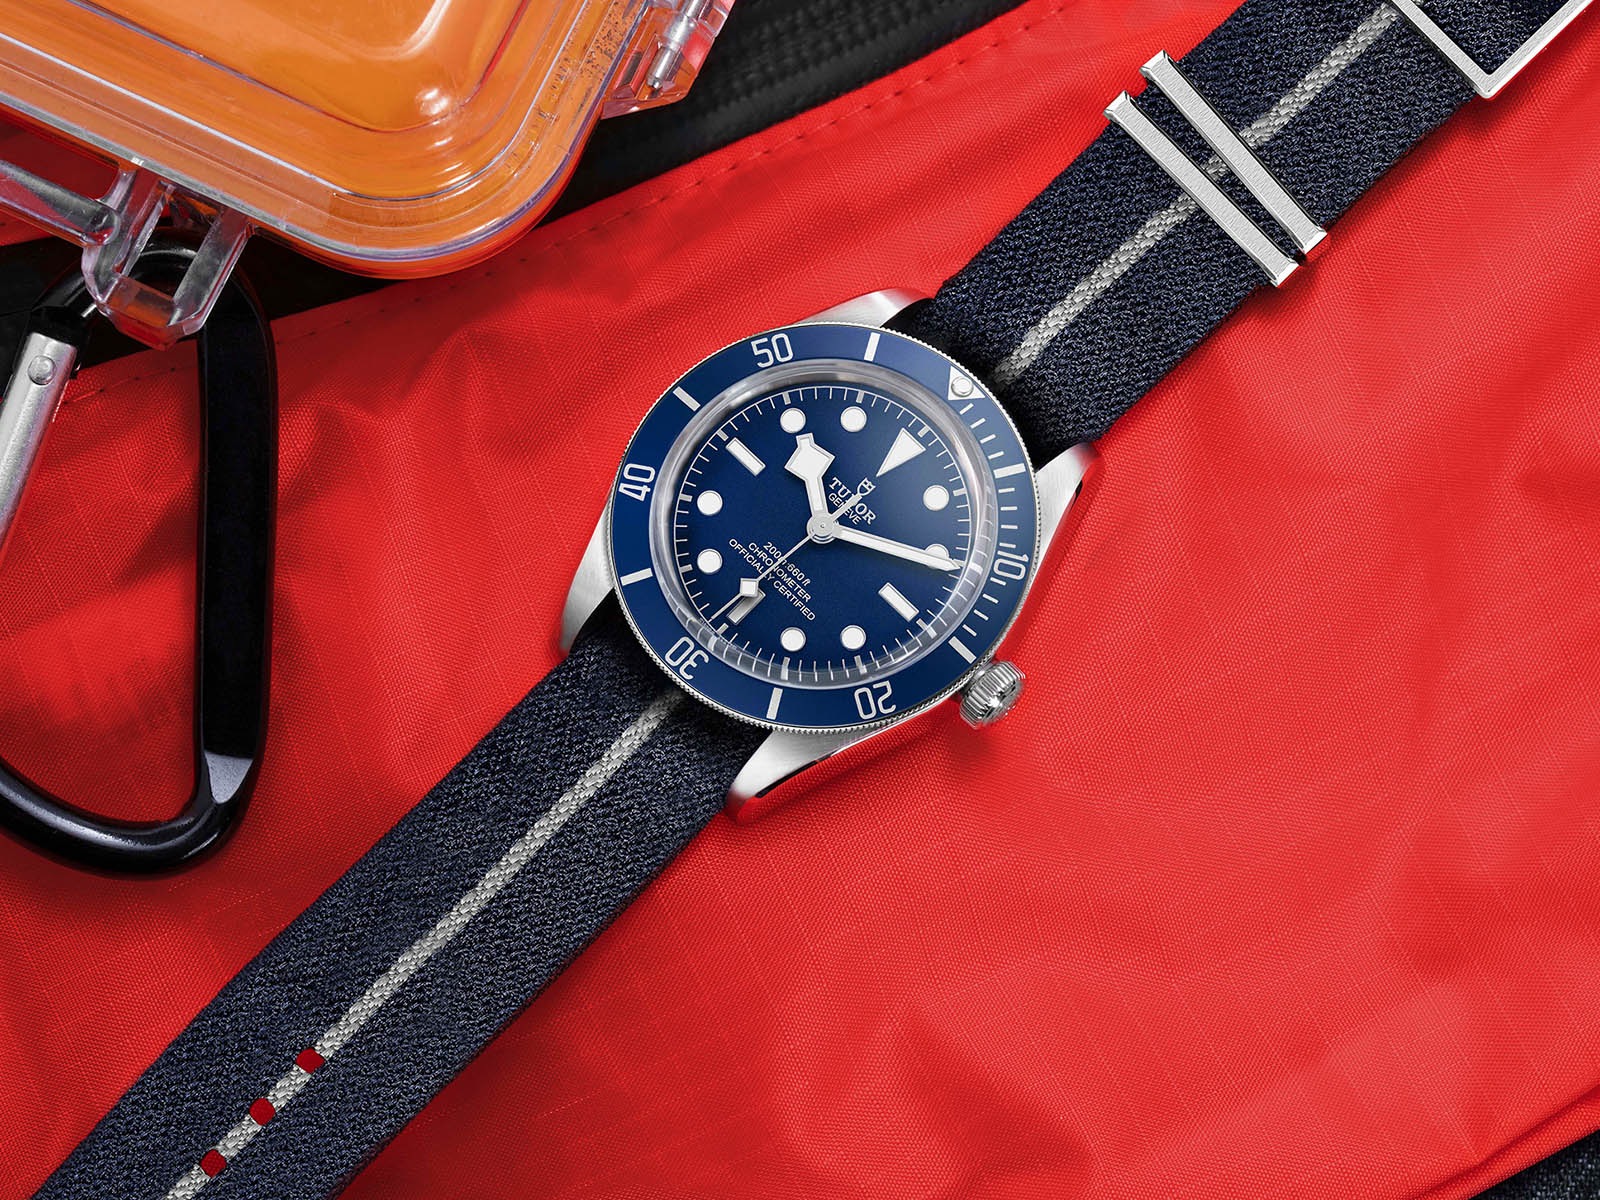 79030b-tudor-black-bay-fifty-eight-navy-blue-4.jpg